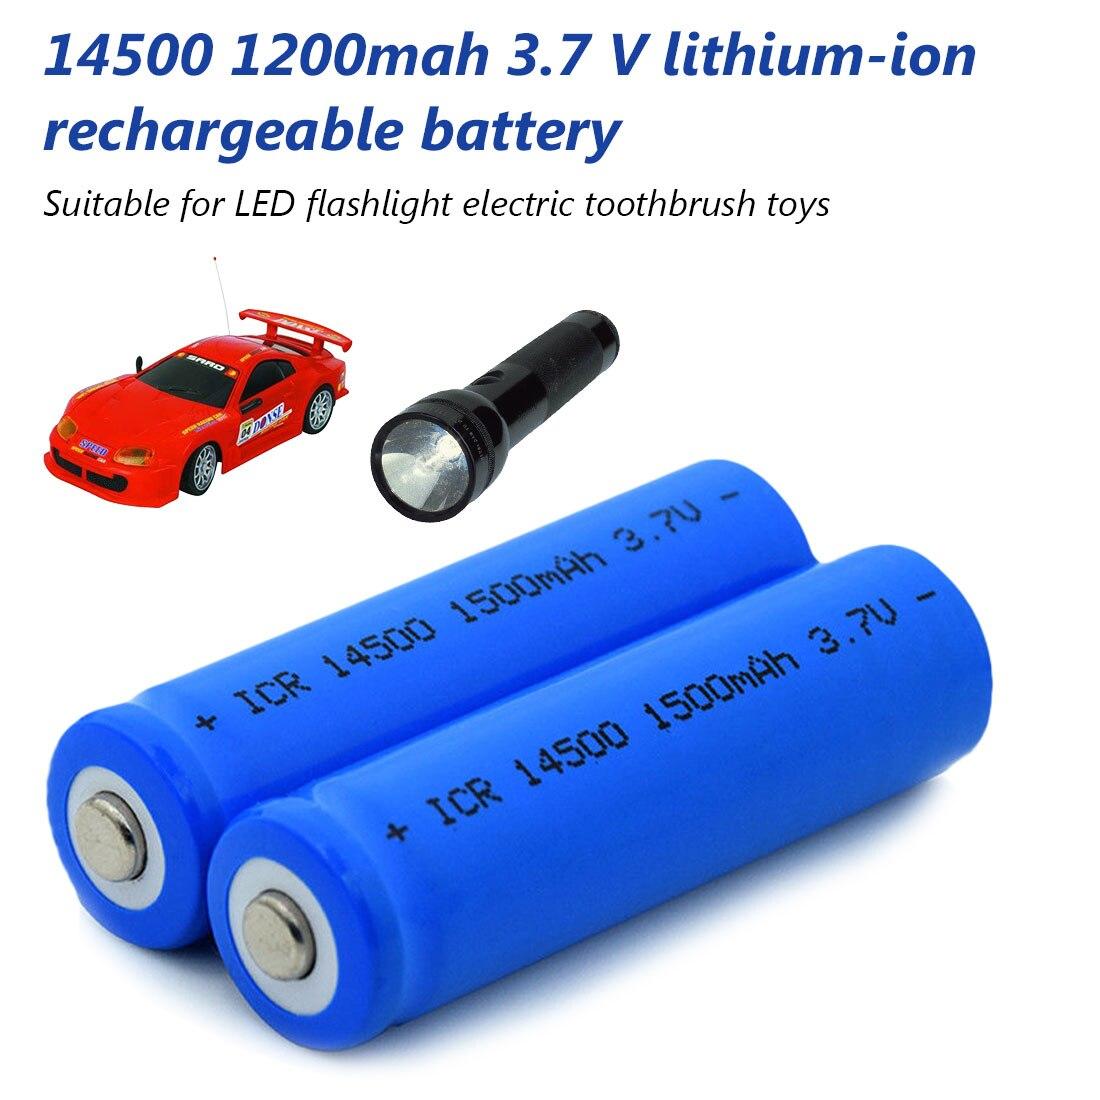 1/2 /4/8/12 sztuk/zestaw AA 14500 800mah 3.7 V akumulator litowo-jonowy akumulator litowo-jonowy do latarki Led reflektory